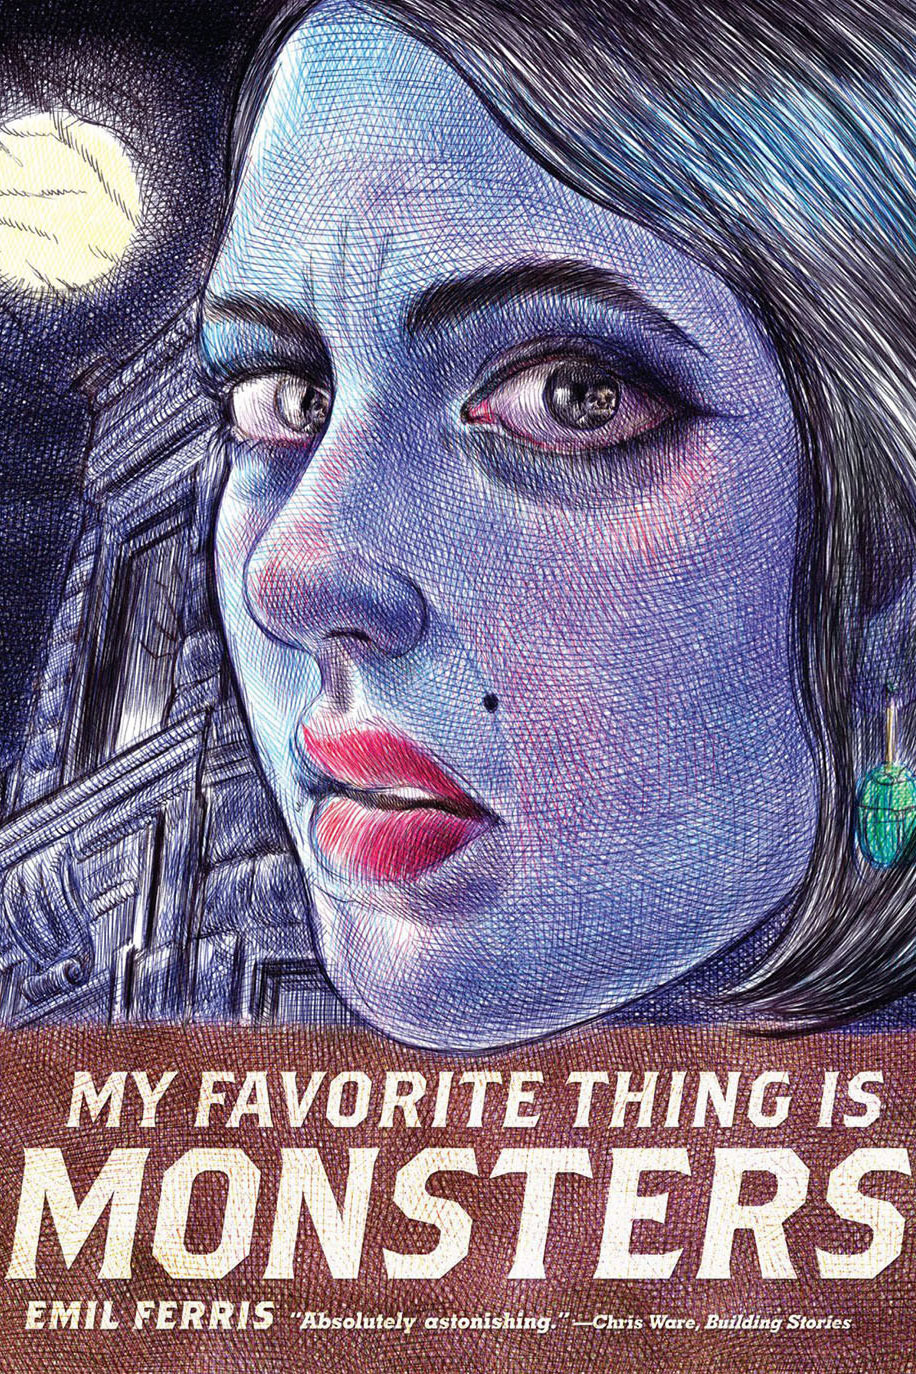 <em>My Favorite Thing Is Monsters</em> by Emil Ferris